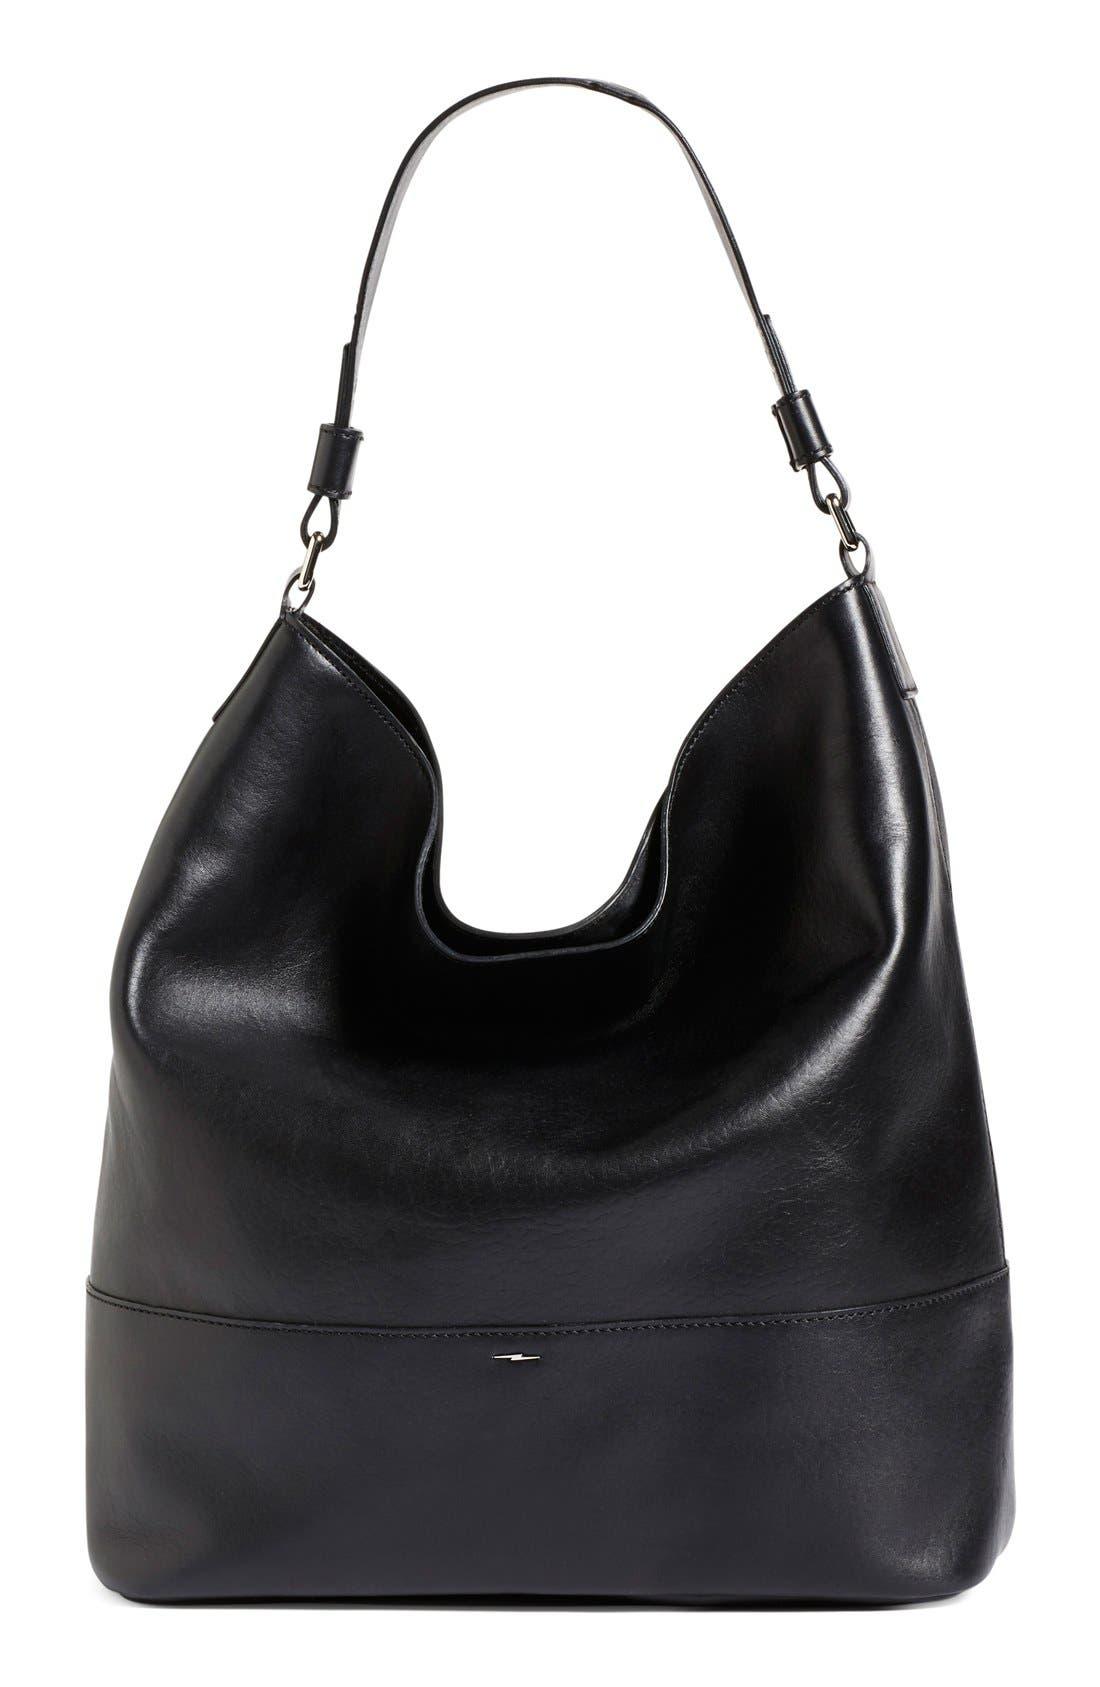 Alternate Image 1 Selected - Shinola Relaxed Leather Hobo Bag